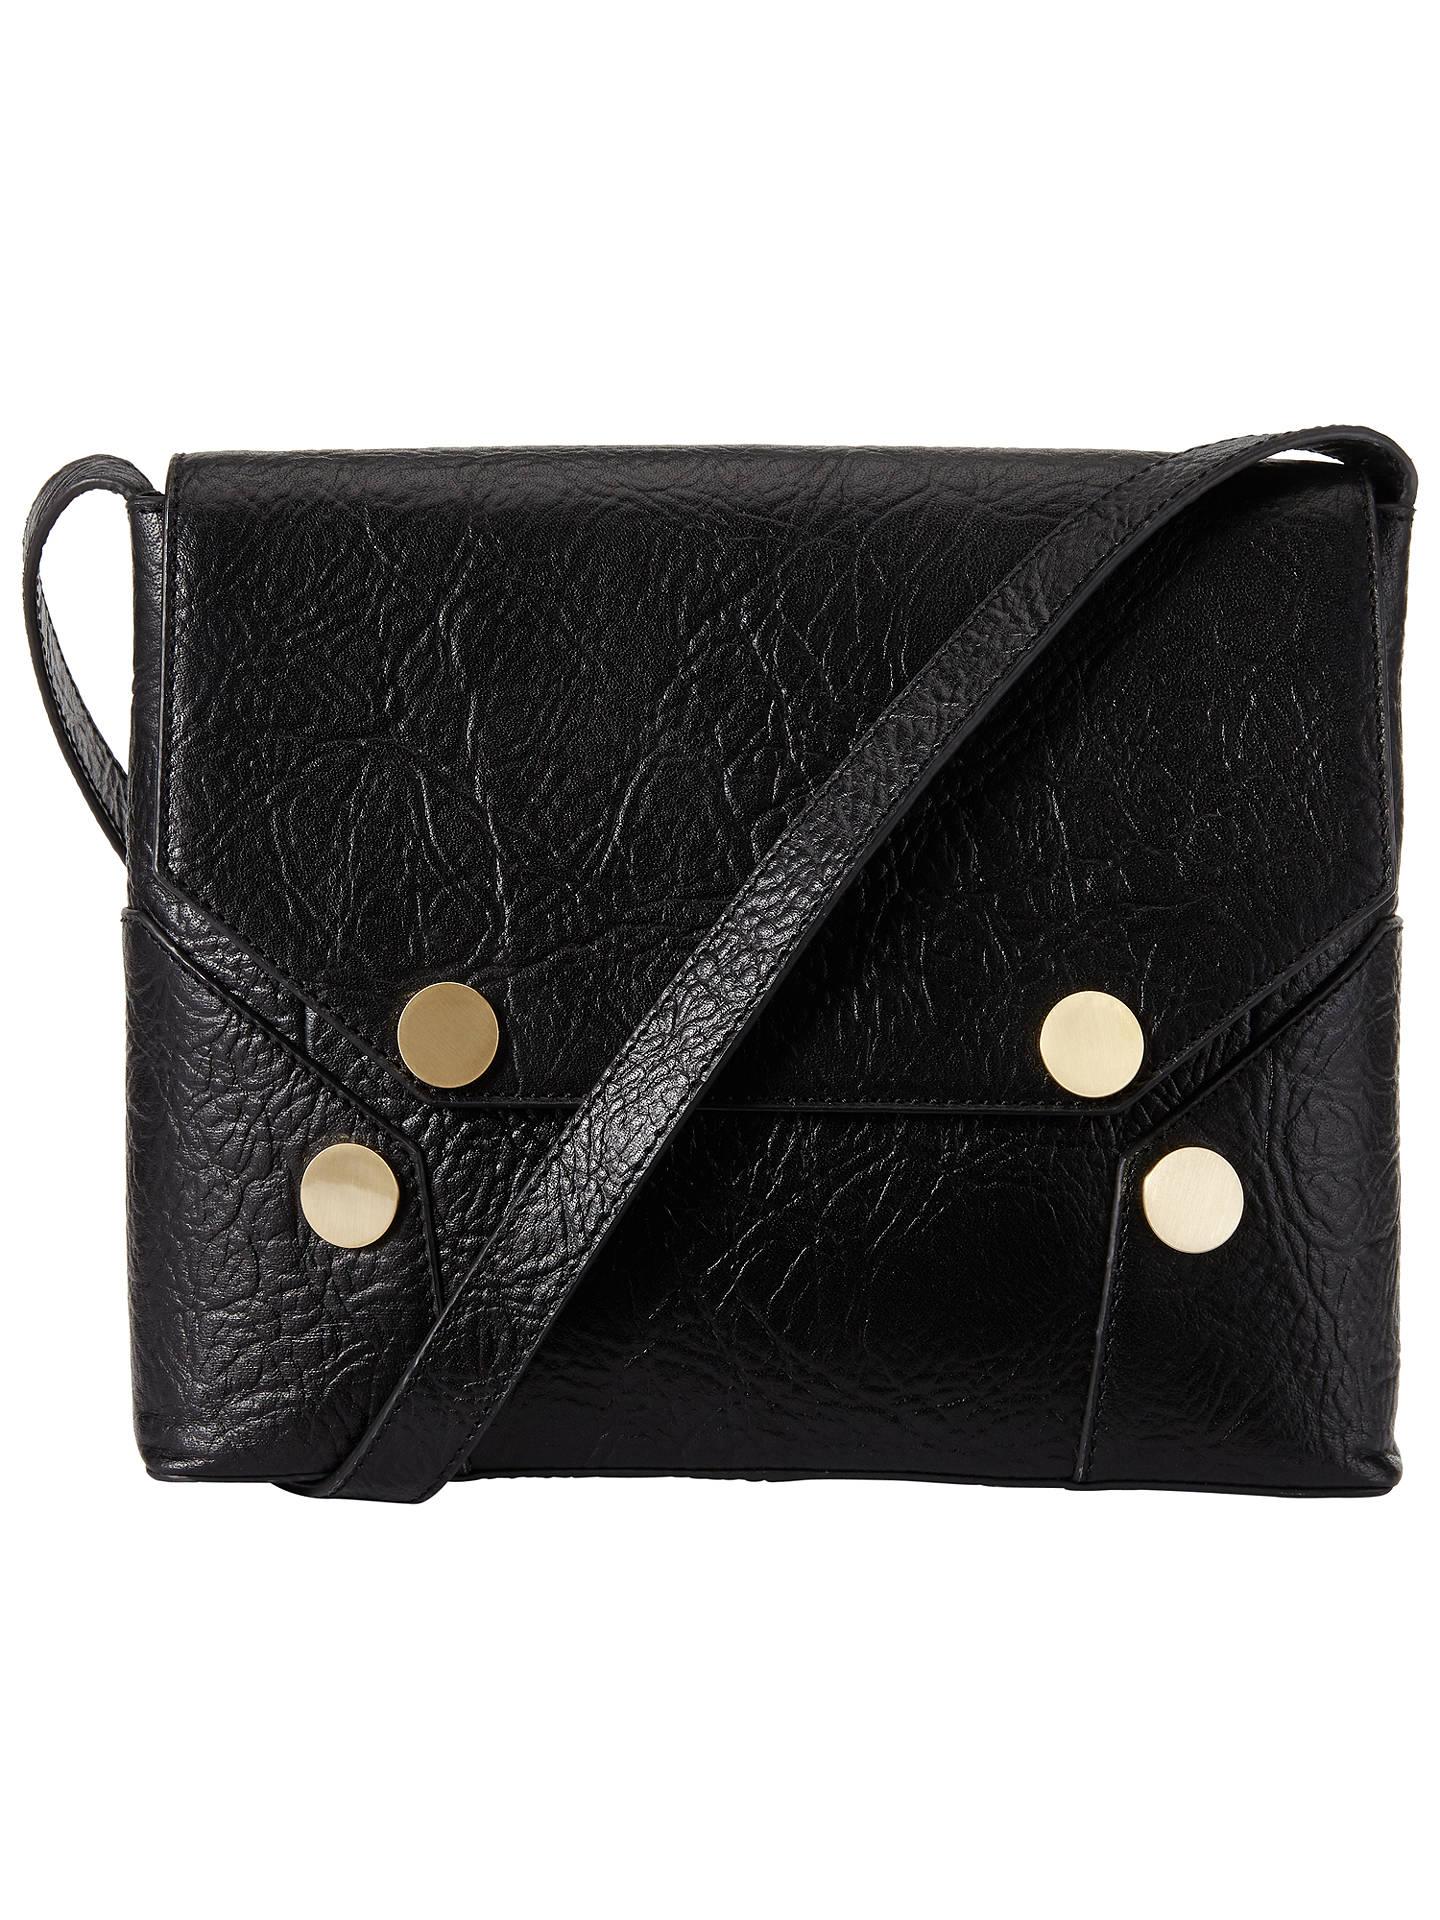 6de52ea40095 Kin by John Lewis Luna Leather Cross Body Bag at John Lewis   Partners